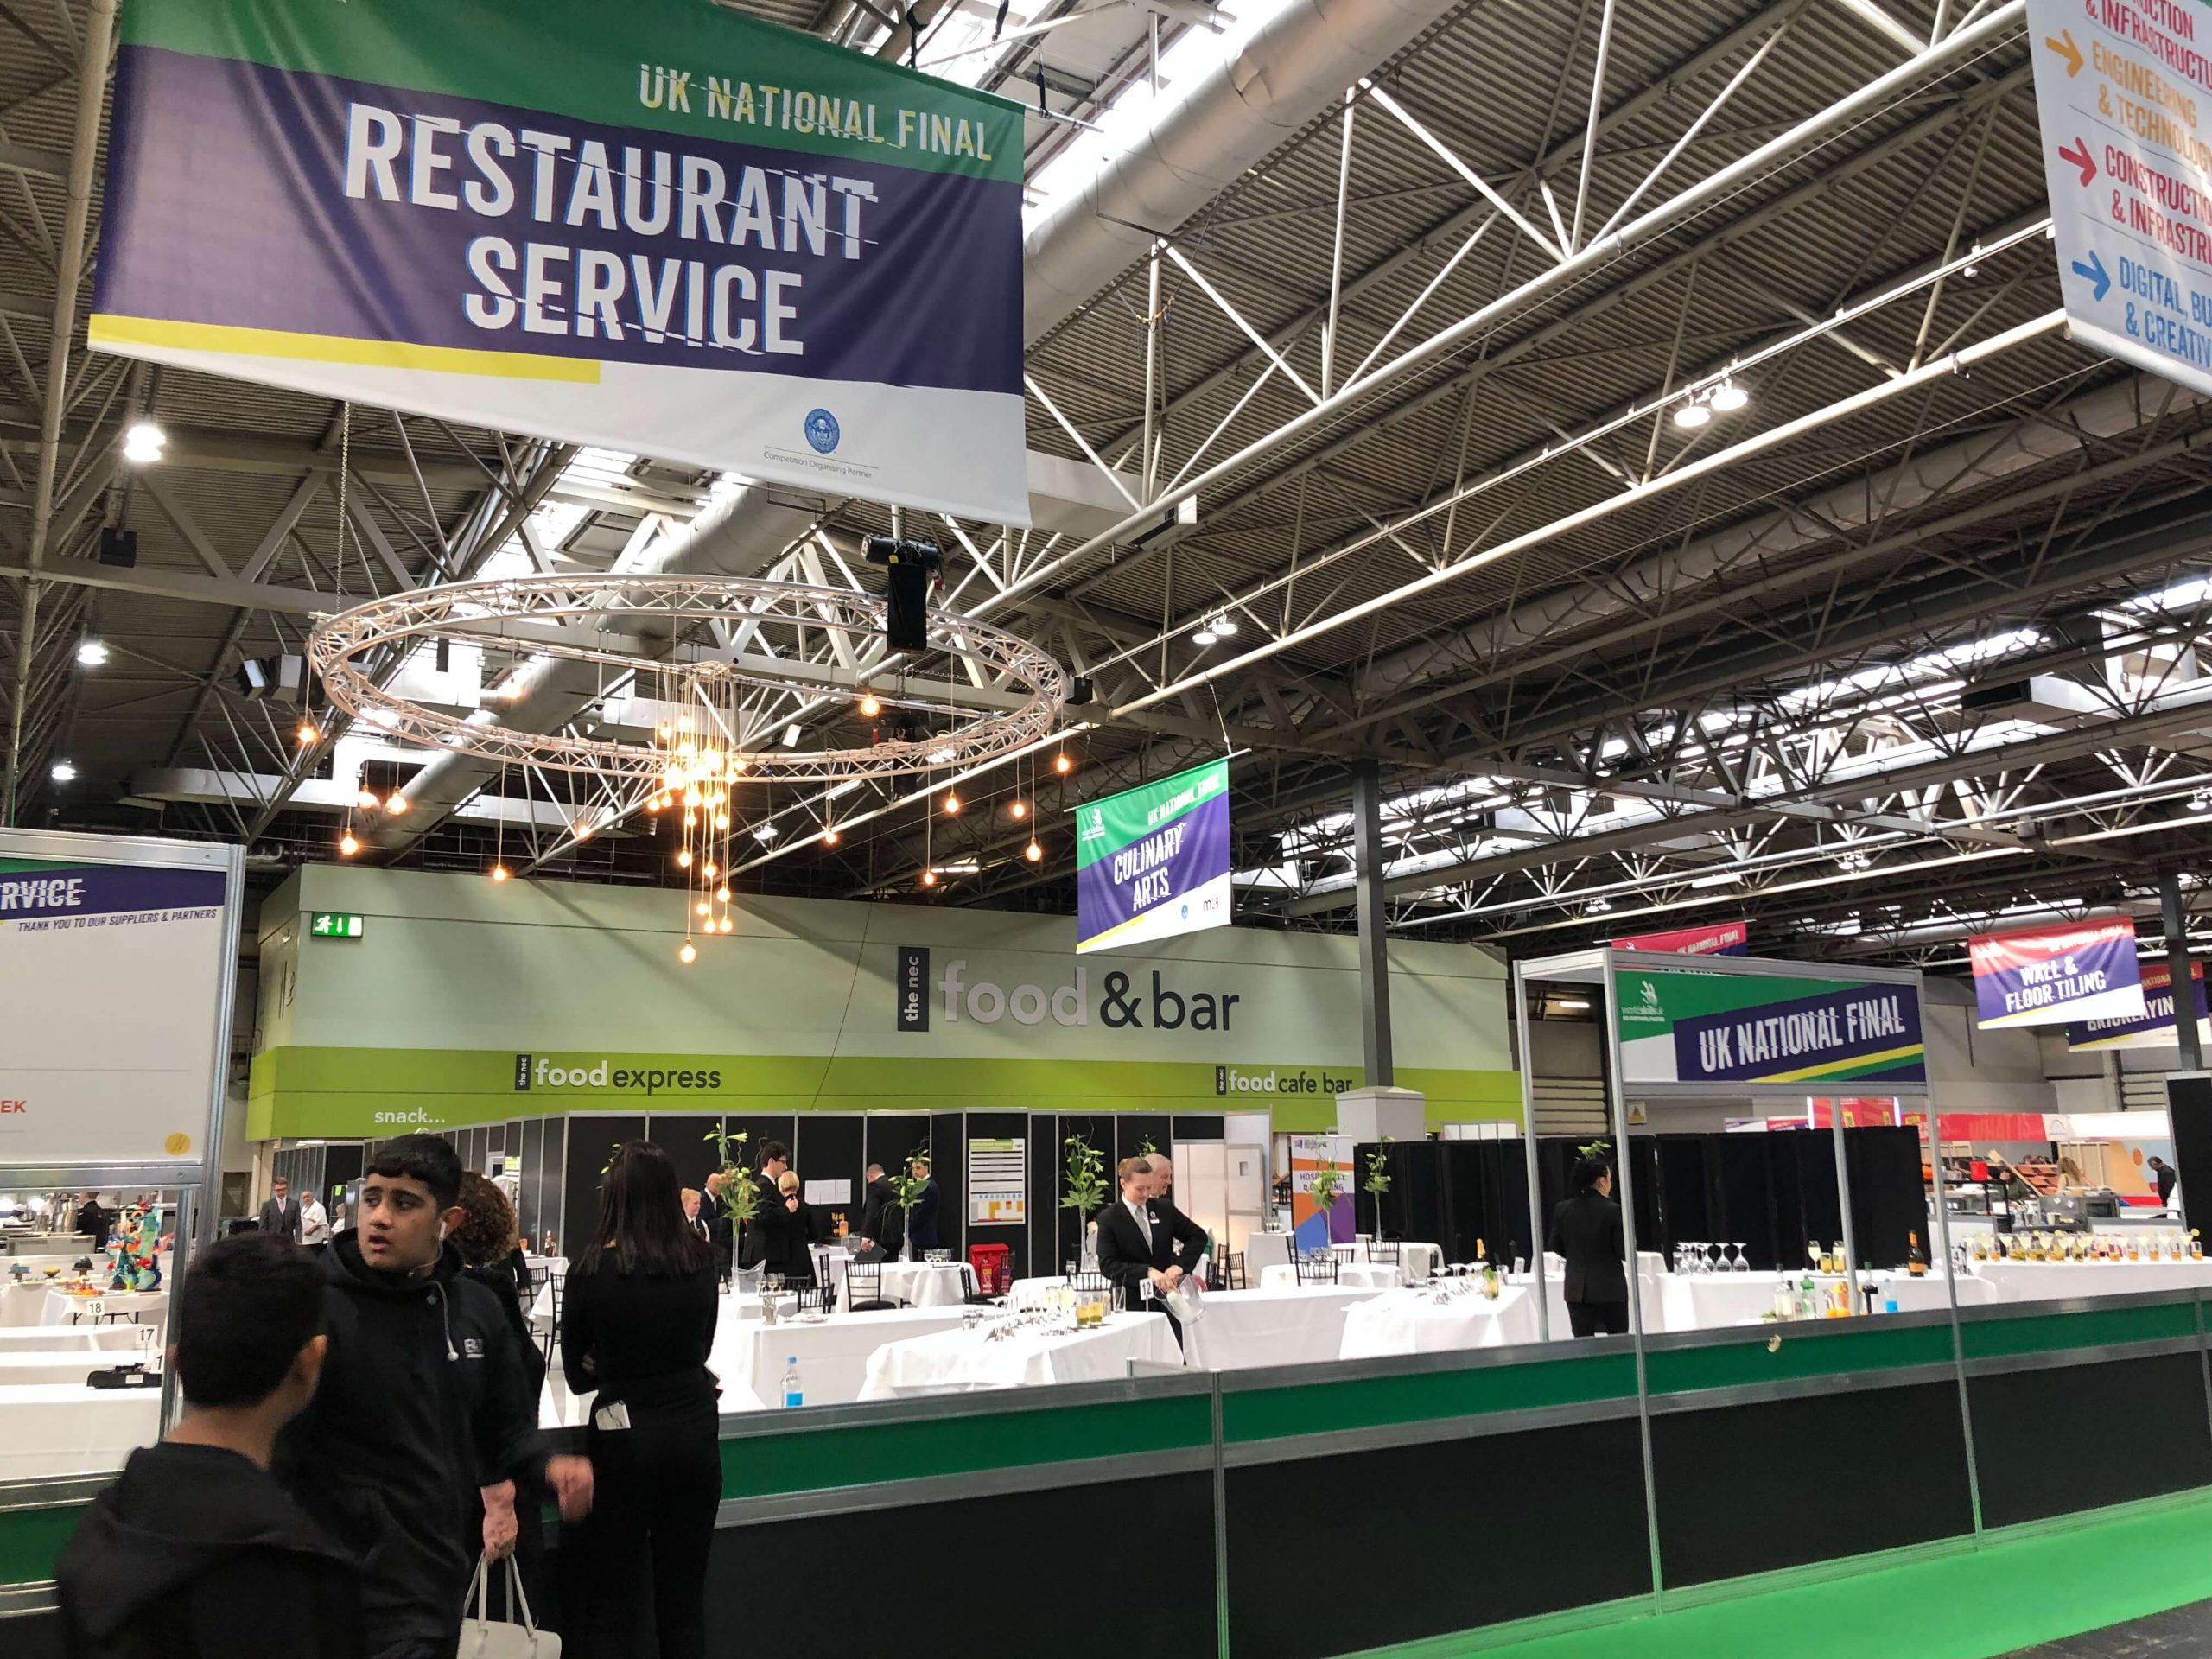 UKCC Mystery Basket Chef Competition at WorldSkills UK 2018, held at the NEC Birmingham